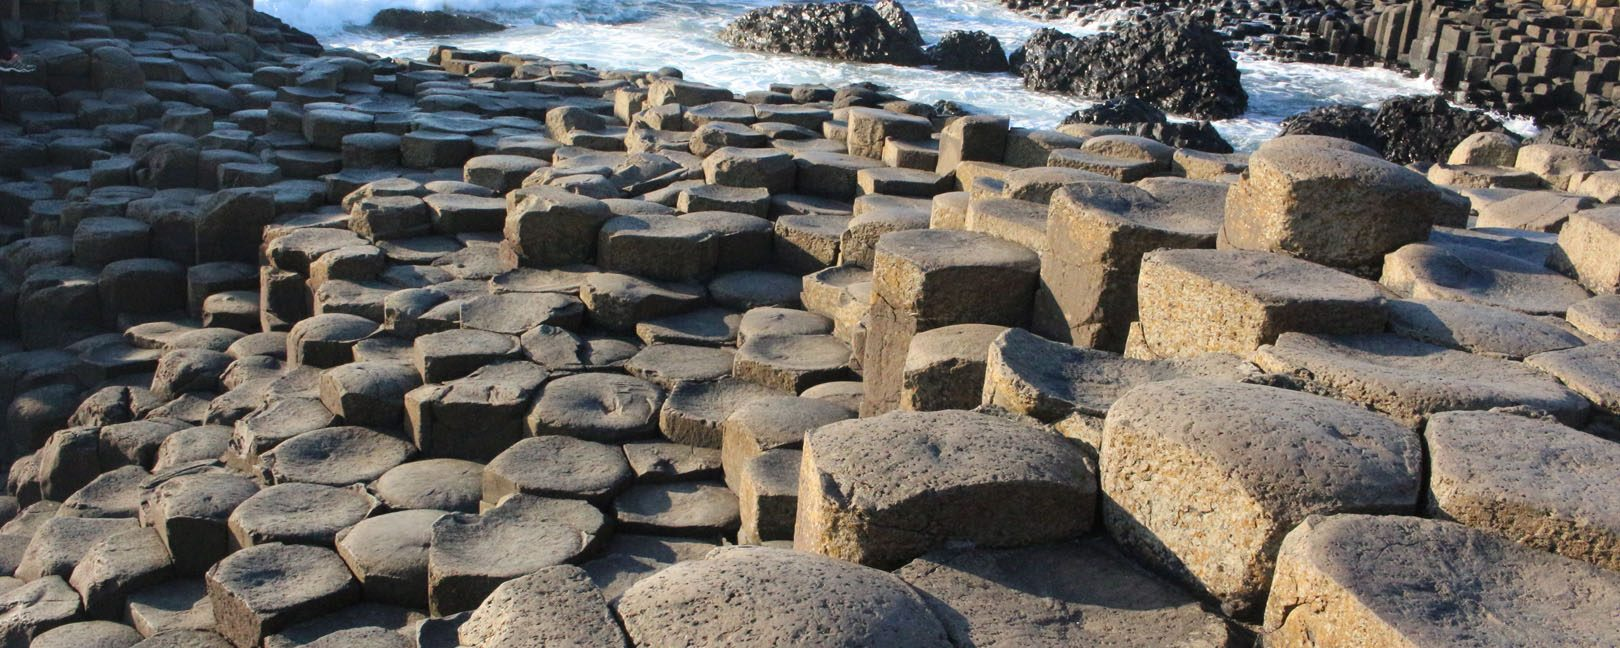 Giants-Causeway Nordirland Roadtrip Basaltgestein the euroamers